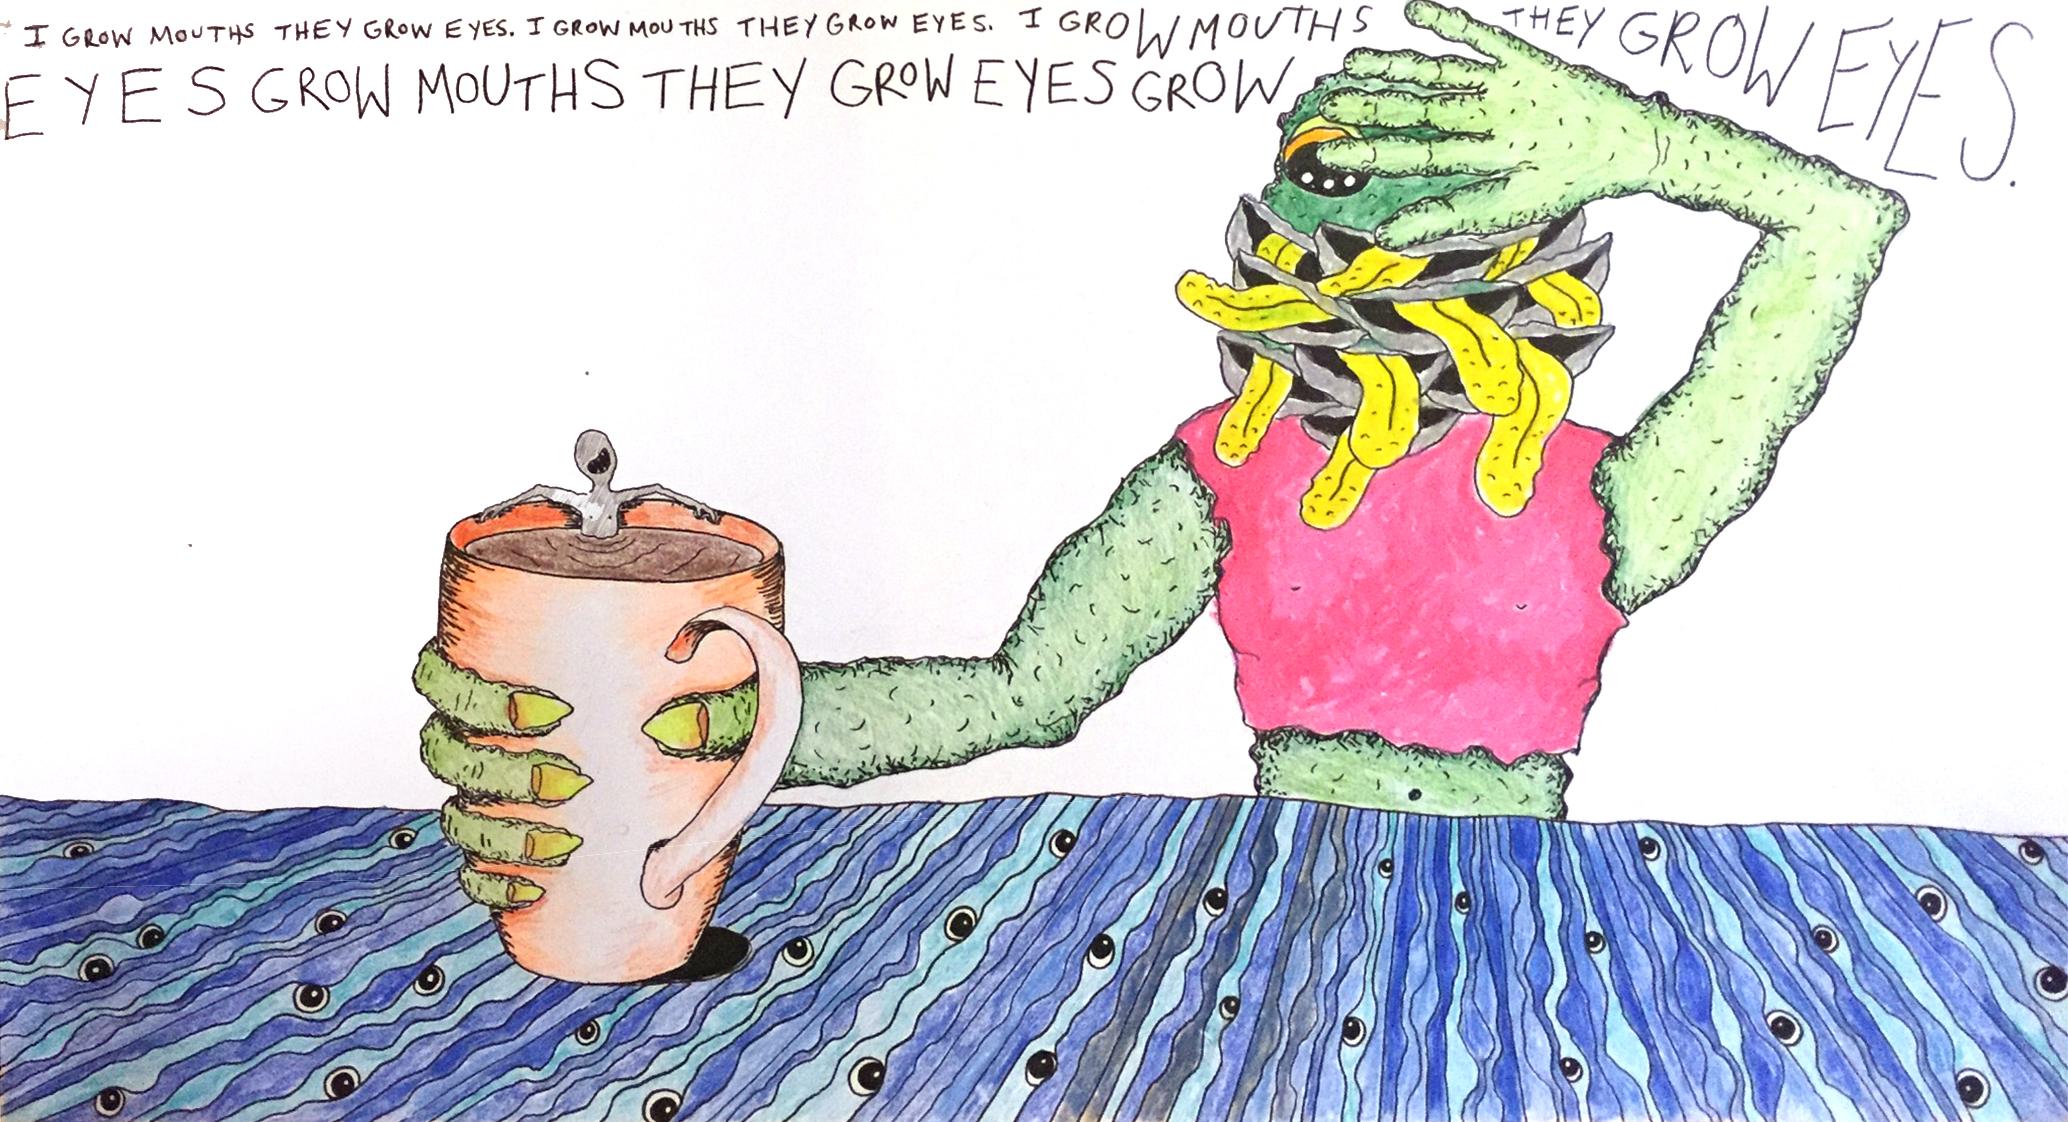 igrowmouthstheygroweyes